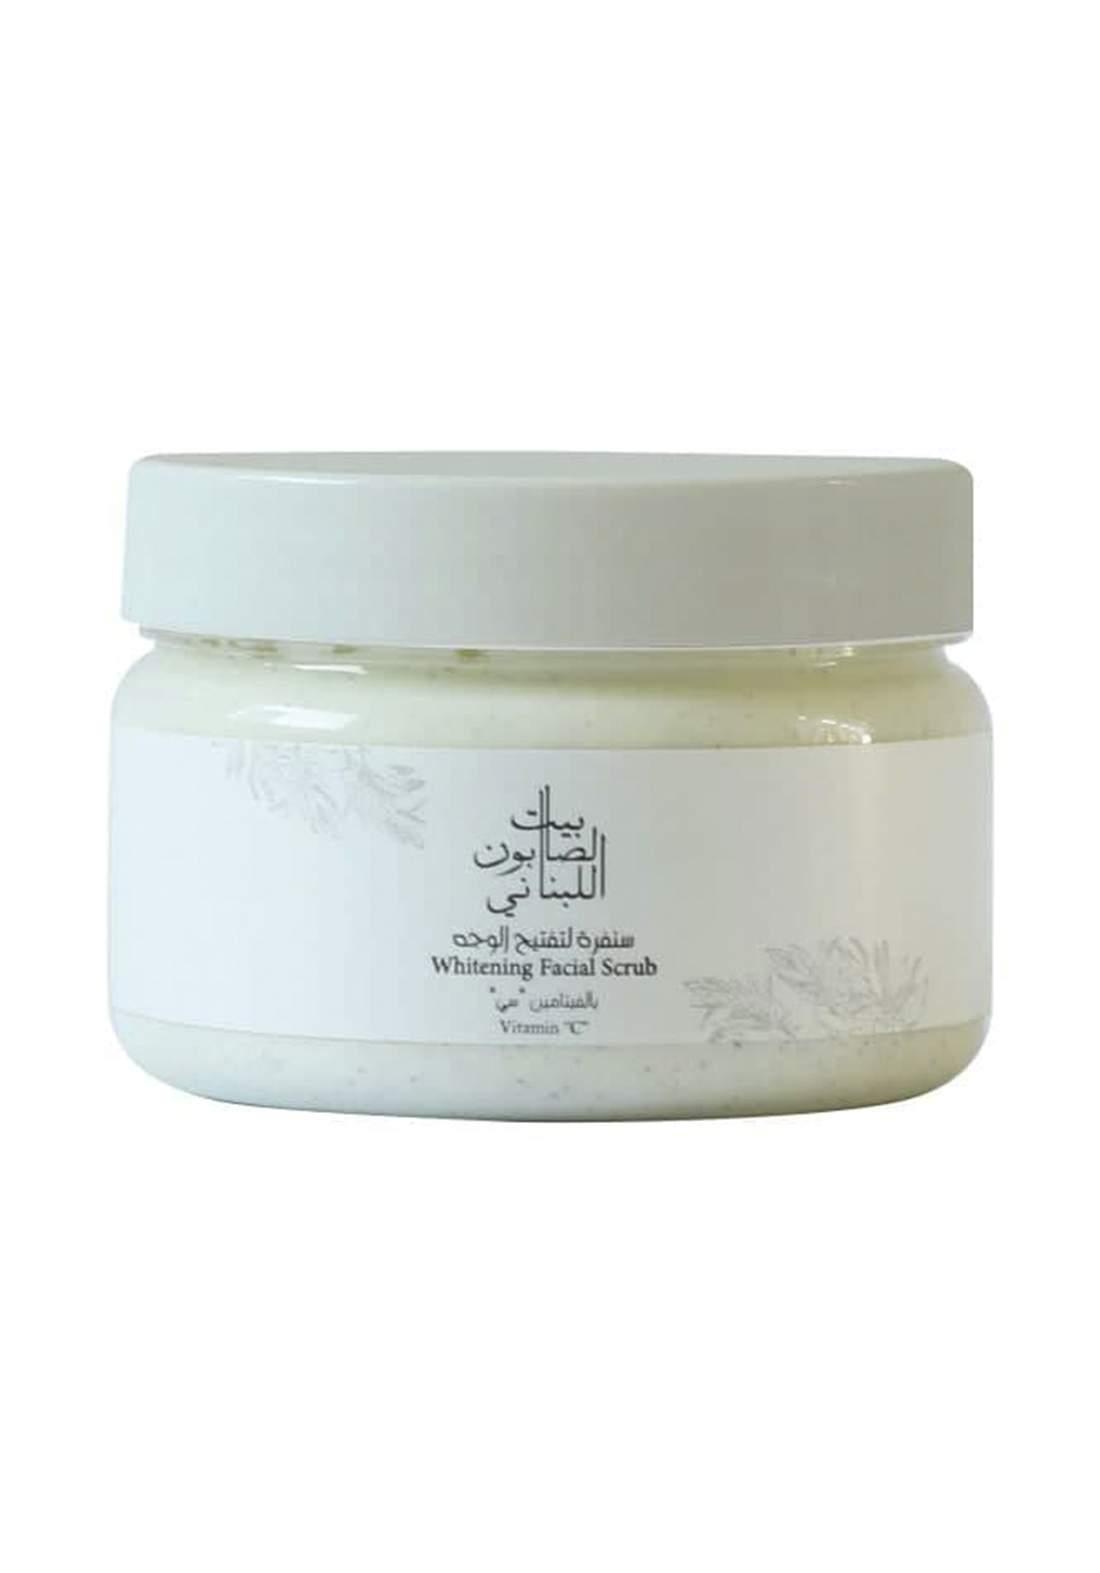 Bayt Alsaboun Alloubnani-317494 Whitening Facial Scrub Vitamin C 150g سنفرة  الوجة